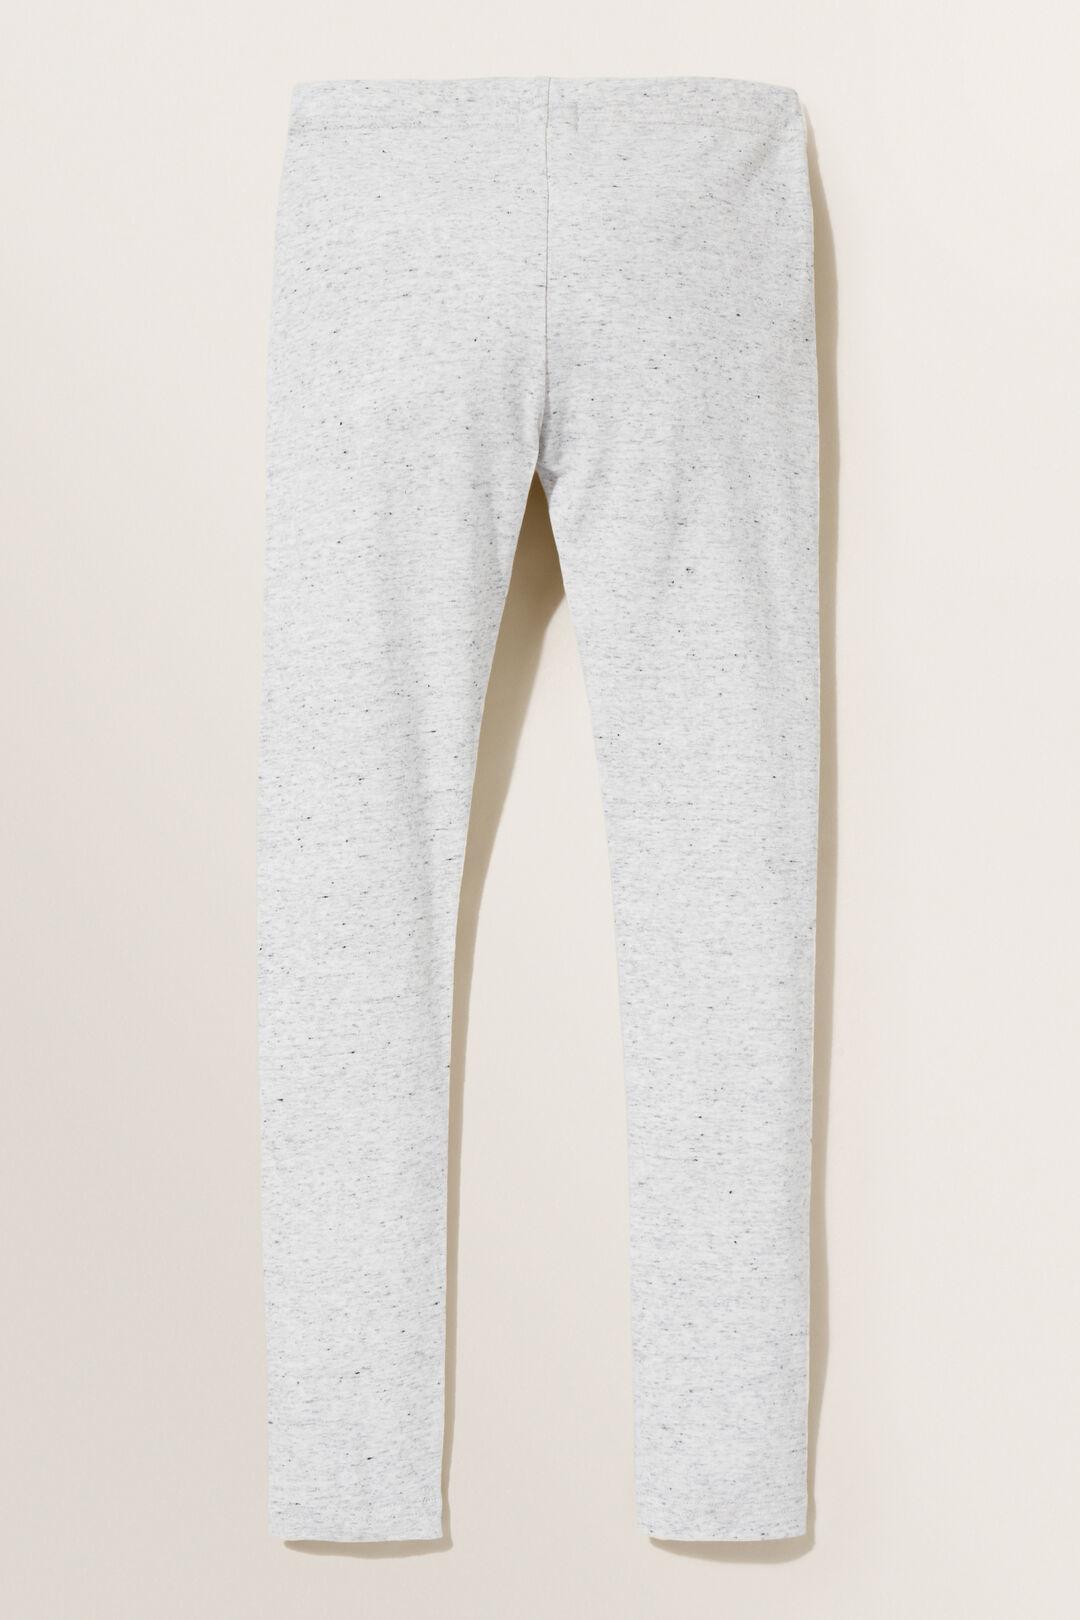 Basic Legging  Cloudy Marle  hi-res